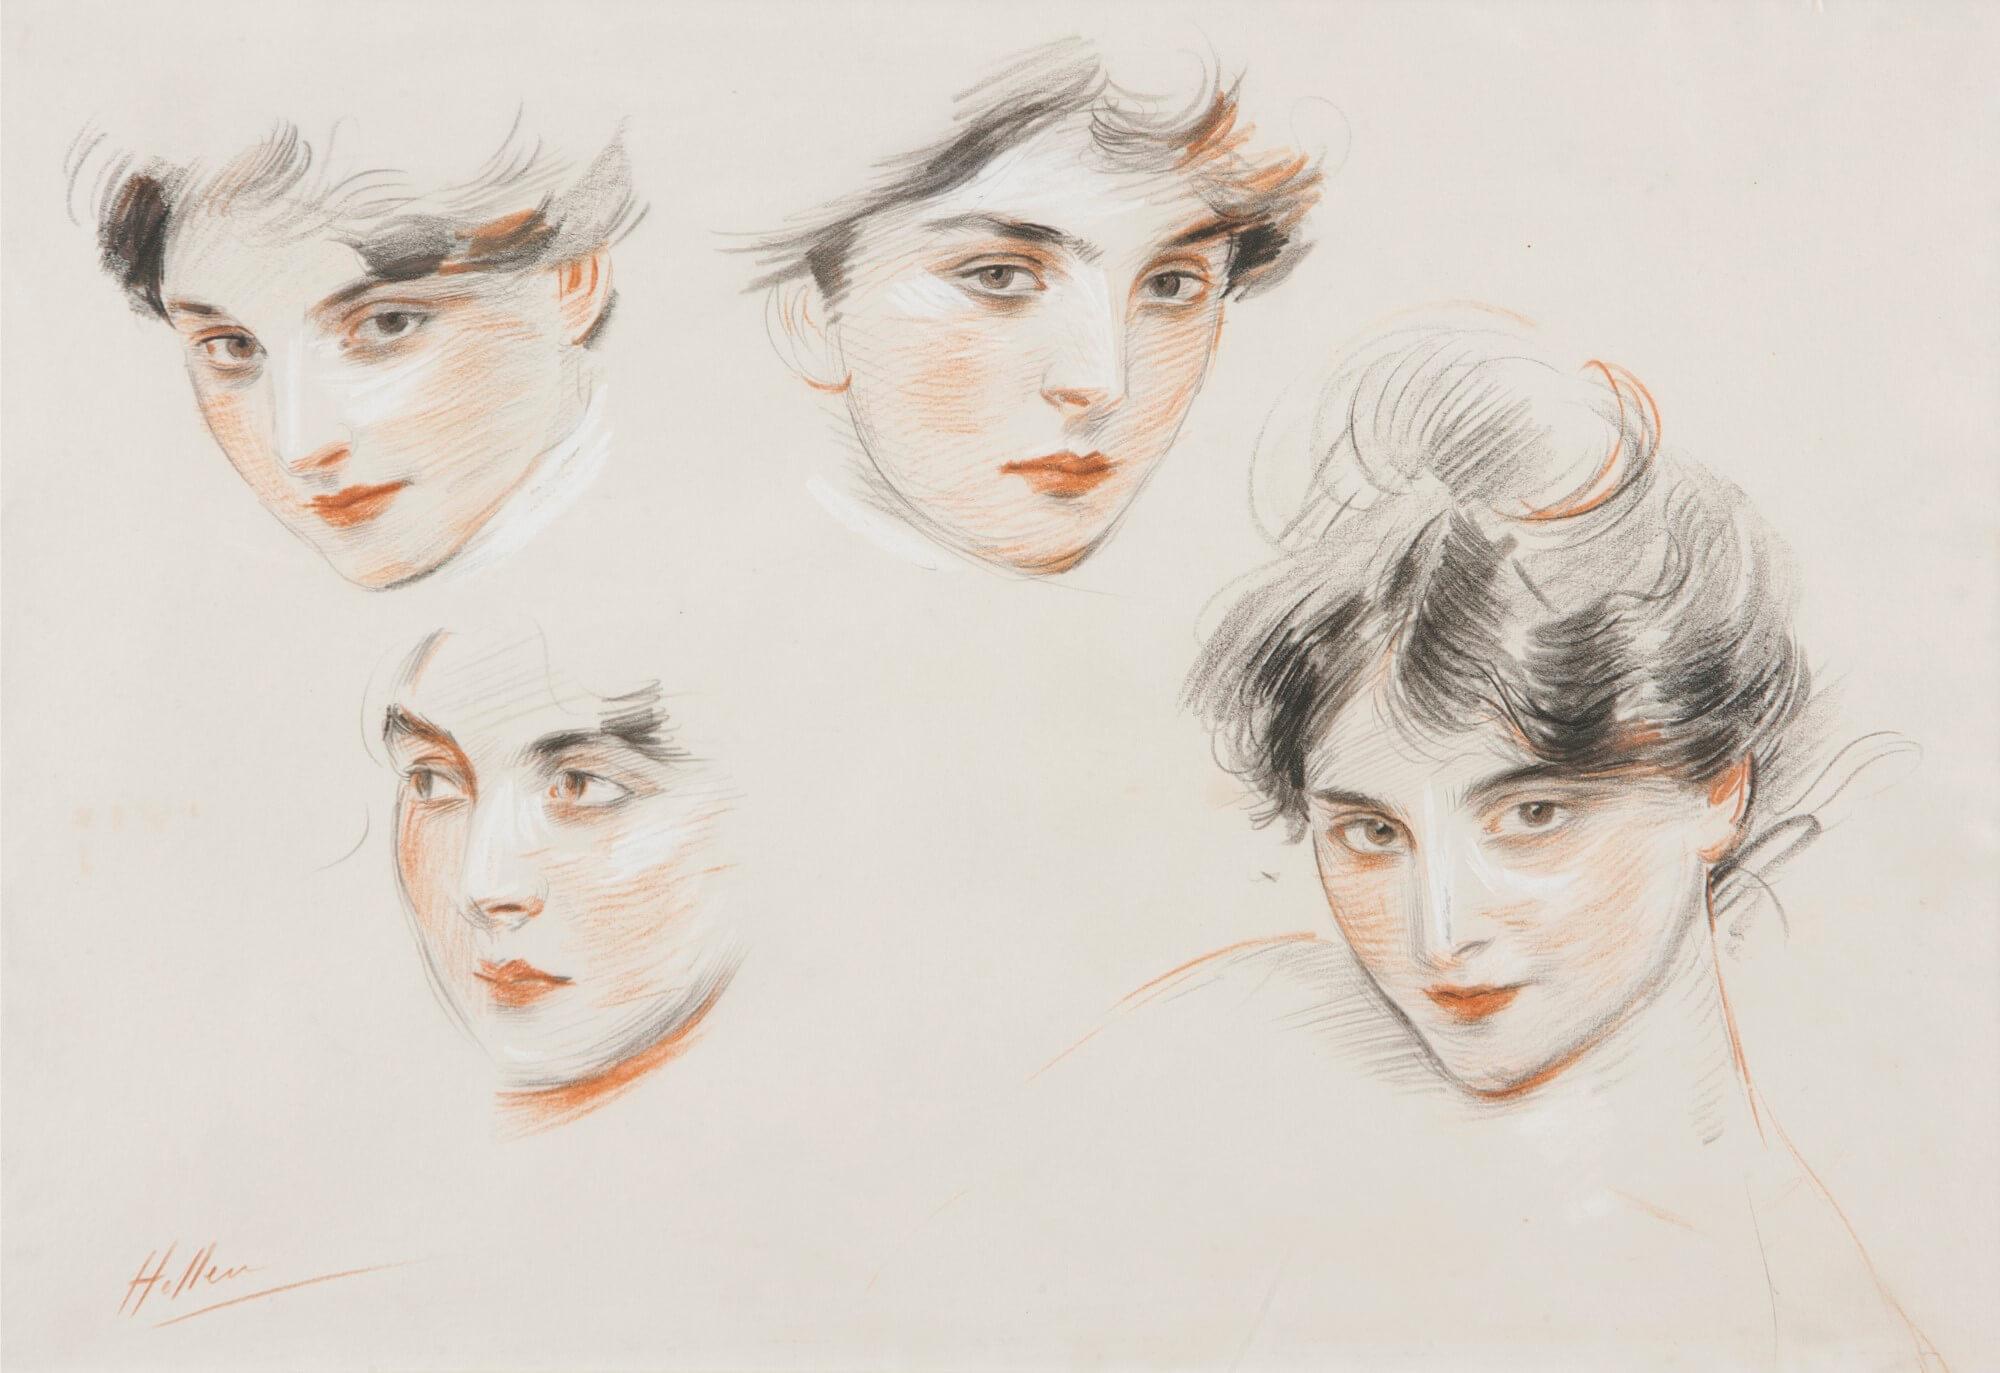 Paul César Helleu. Mademoiselle Conquis, étude de têtes, 1890 circa. Galleria Bottegantica